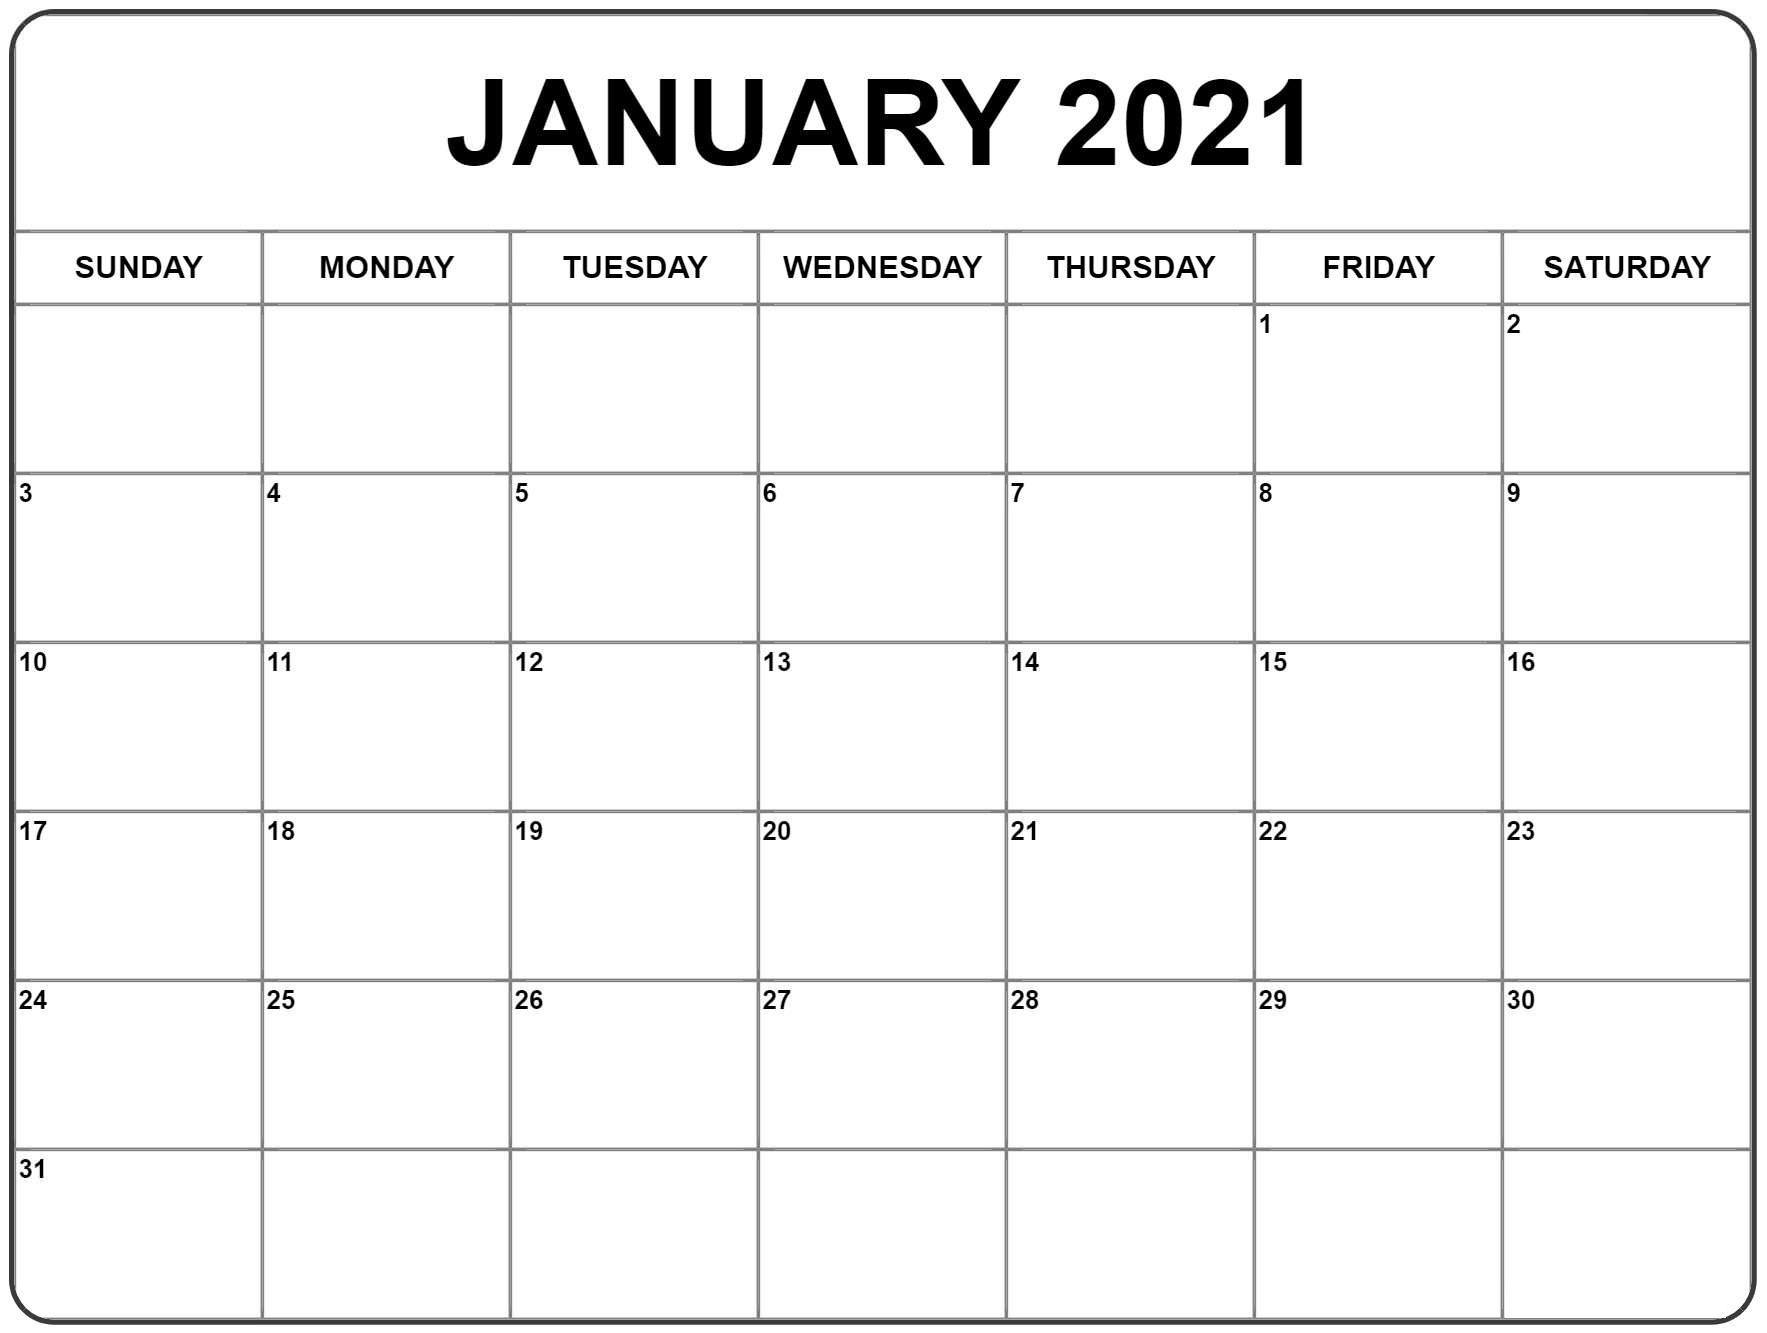 Montly Calendar To Type In - Example Calendar Printable